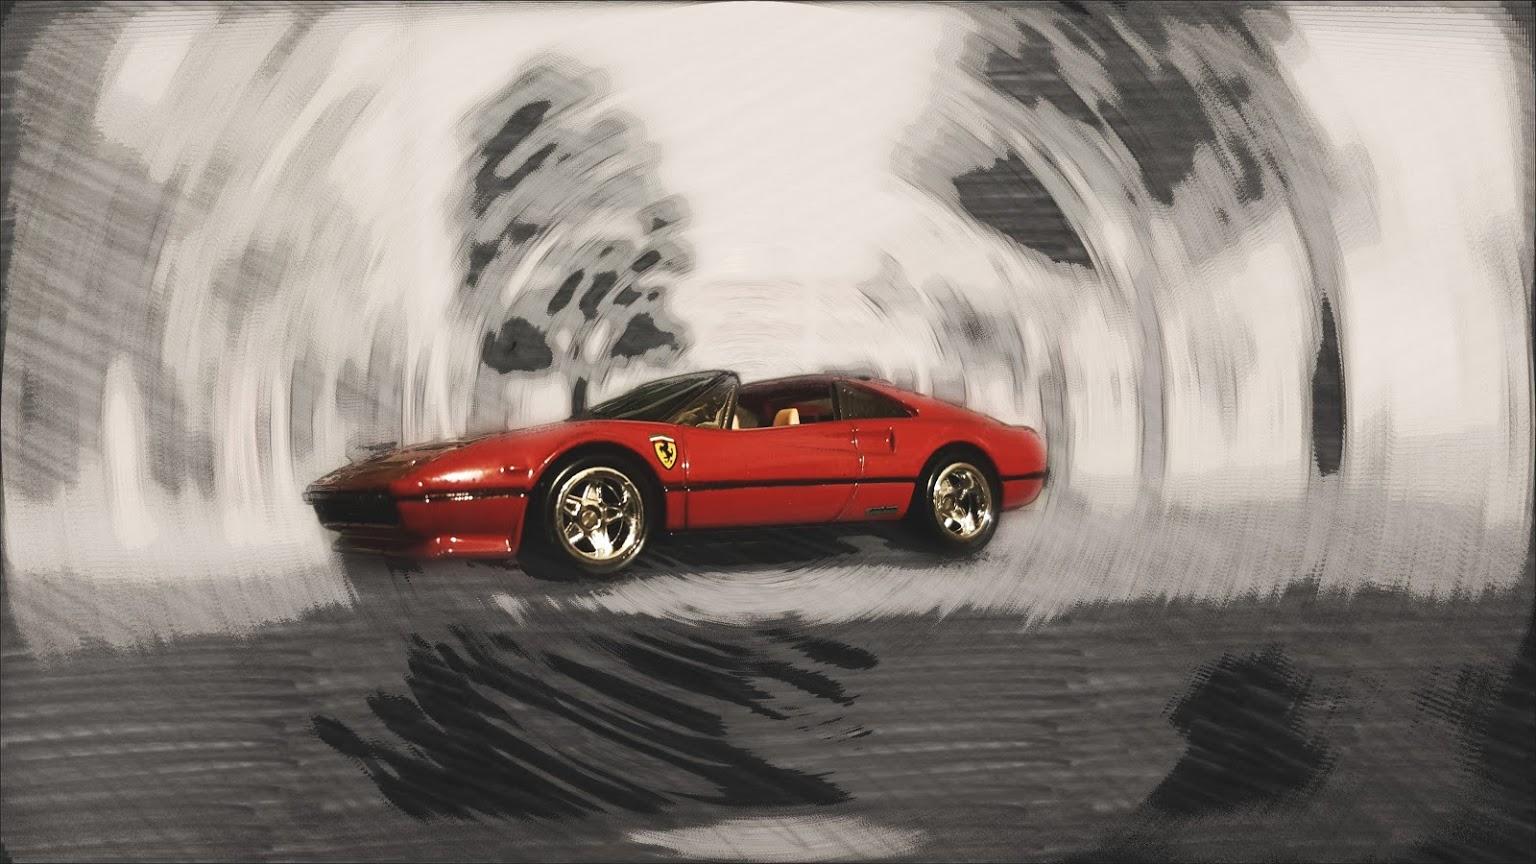 Ferrari 308 spin blur - Custom Hot Wheels & Diecast Cars